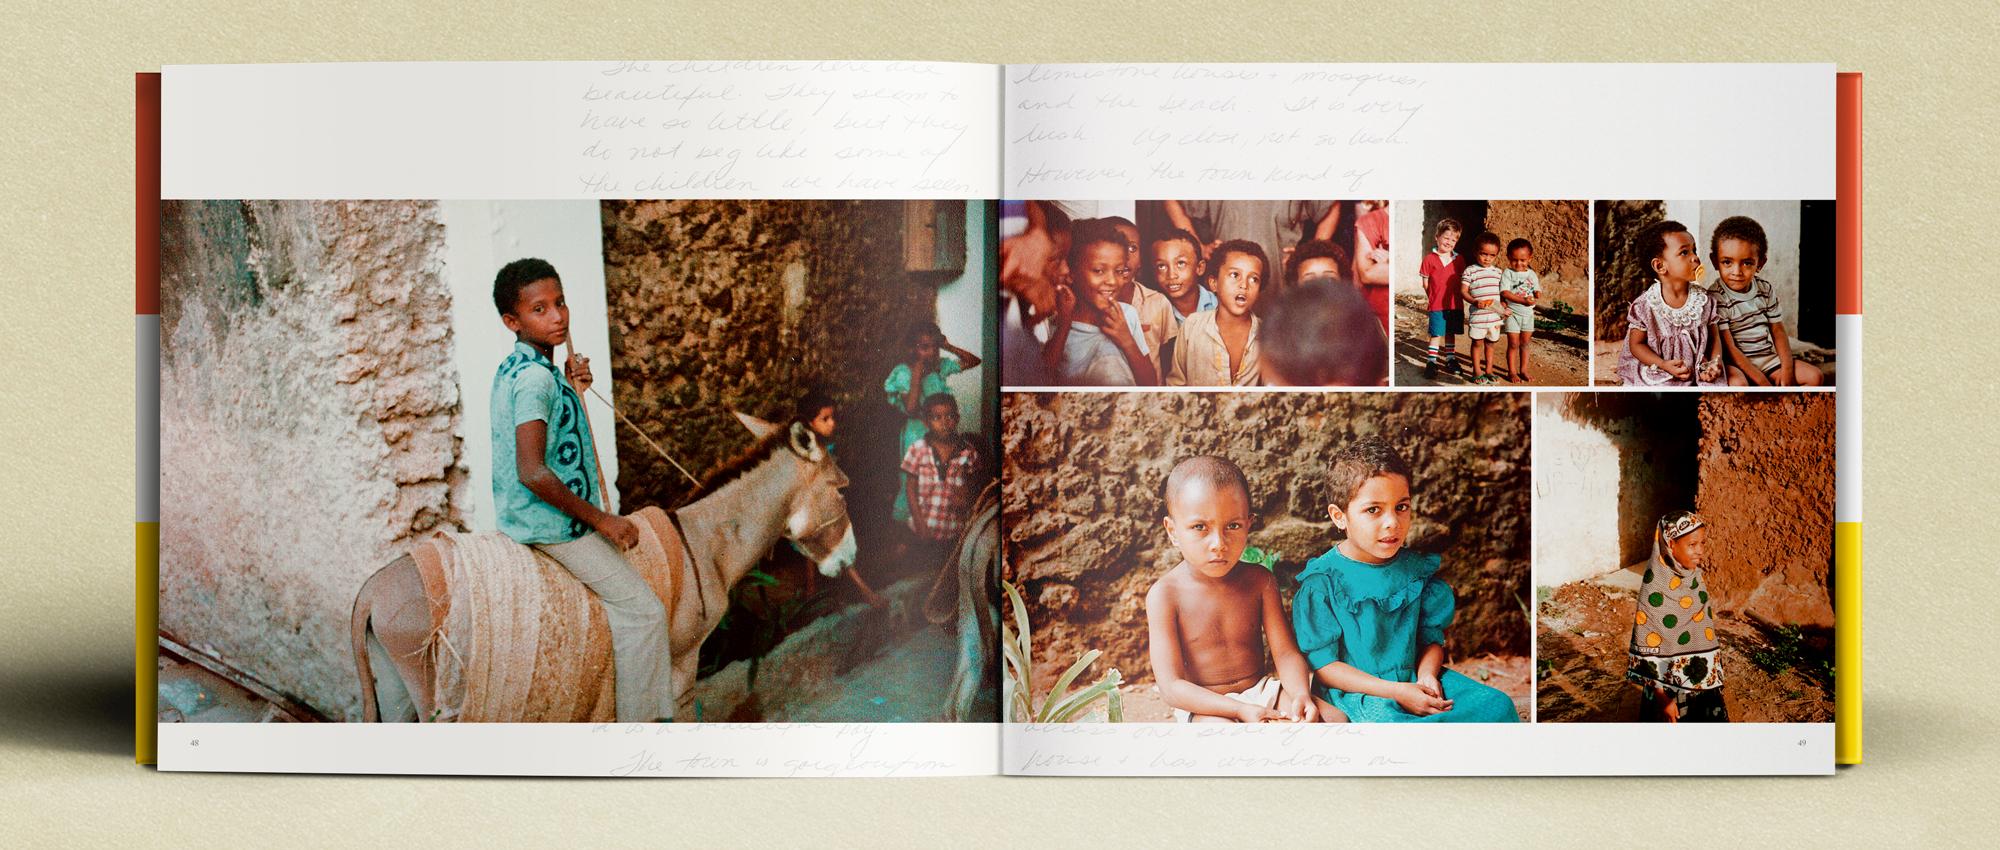 AfricaBook_spread5.jpg